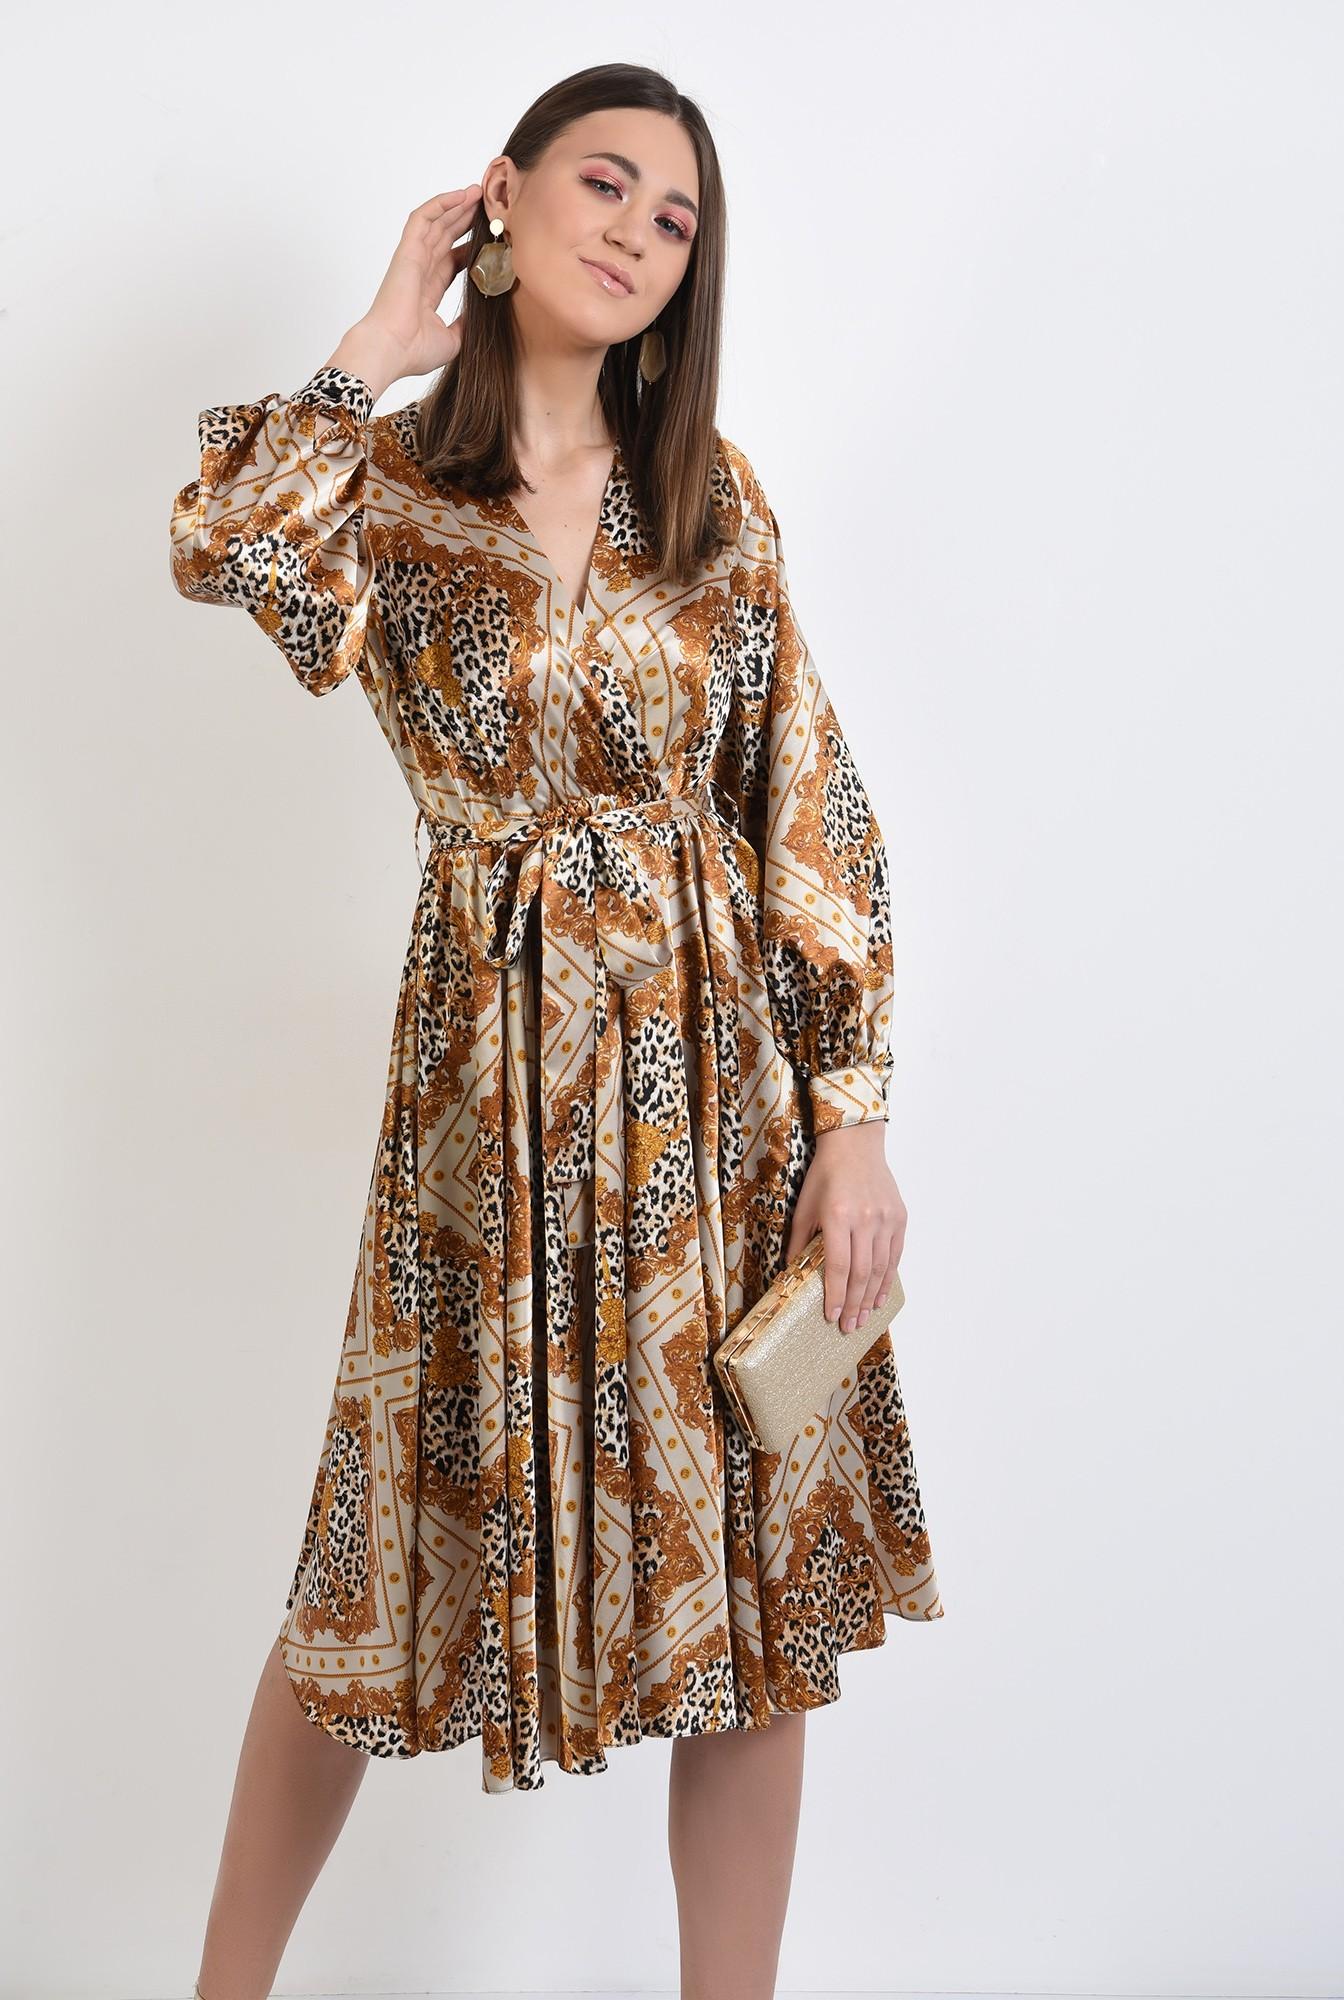 rochie eleganta, midi, evazata, cu imprimeu, animal print, rochie de primavara